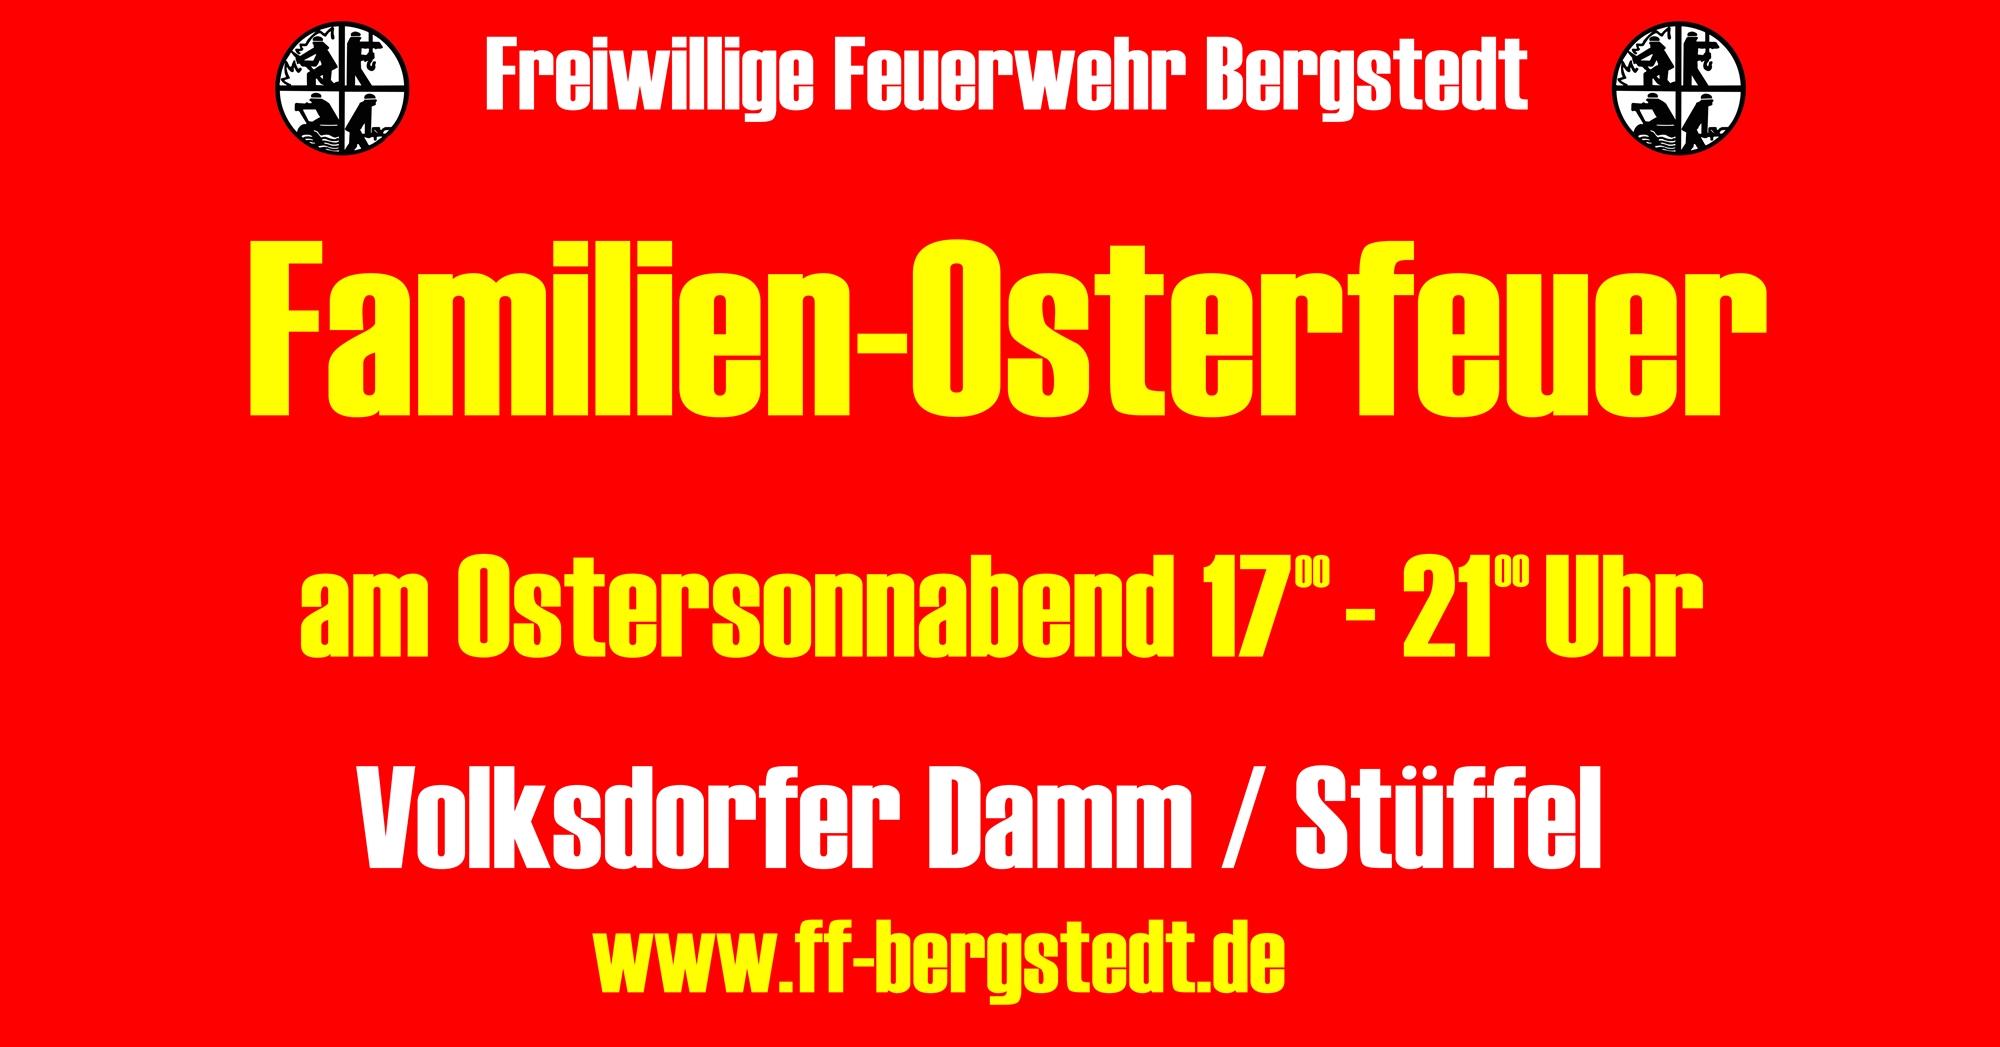 Osterfeuer Bauzaun 2017